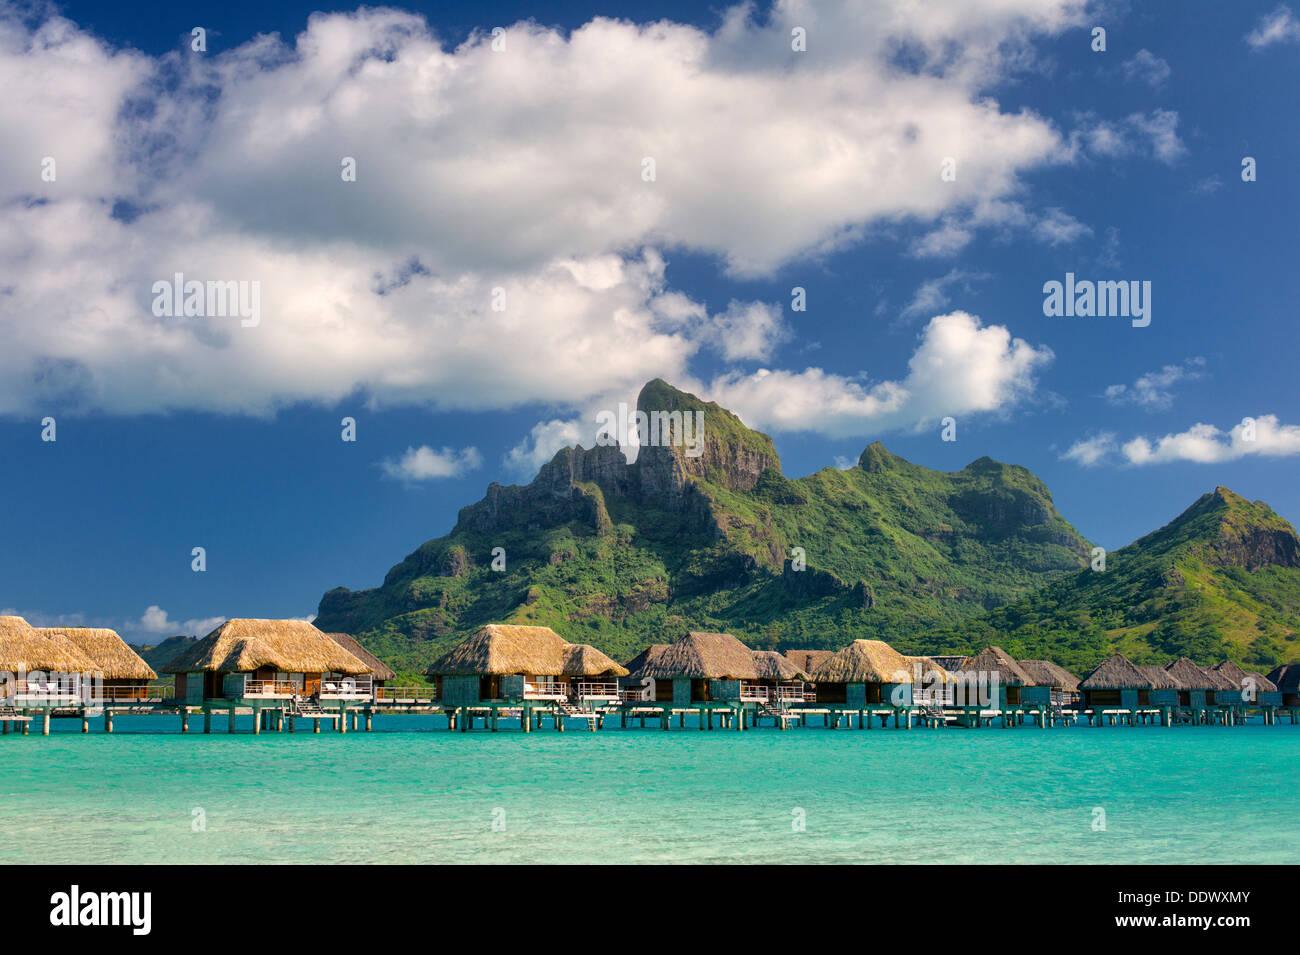 Bungalows over water and Mt. Otemanu. Bora Bora. French Polynesia - Stock Image